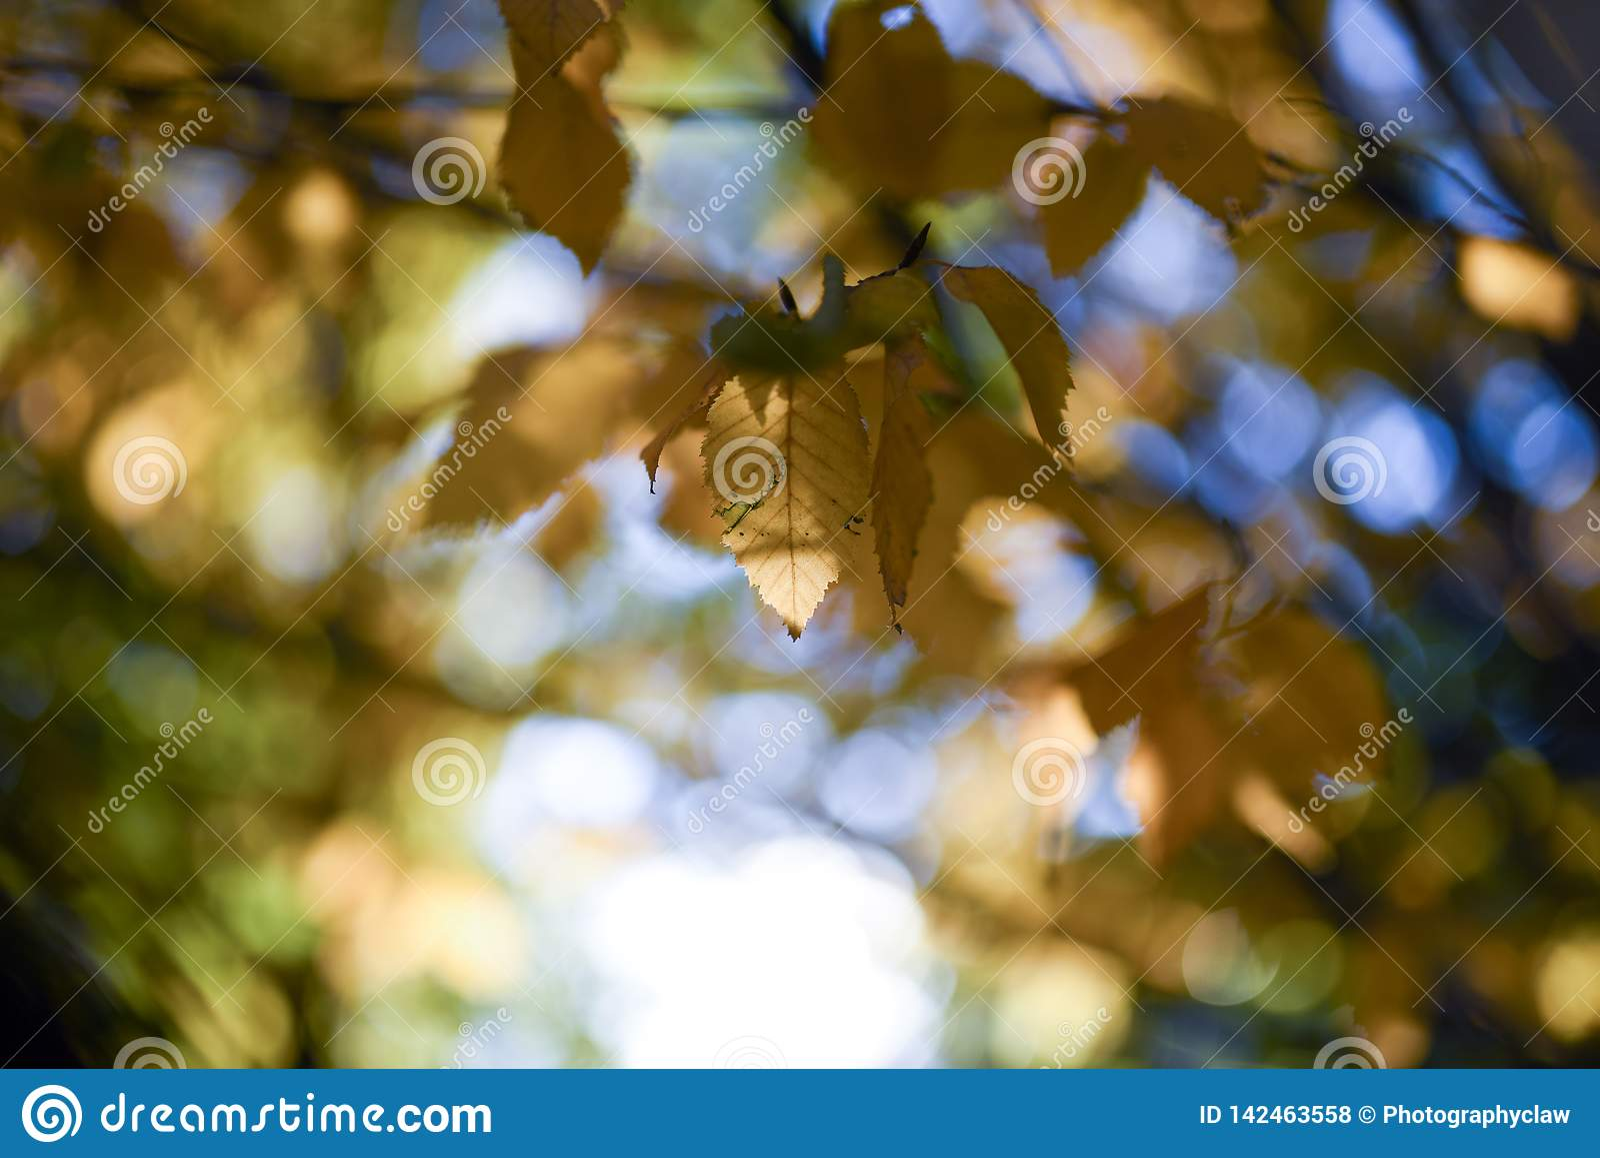 Herbstlaub-Blätter färben Bokeh gelb